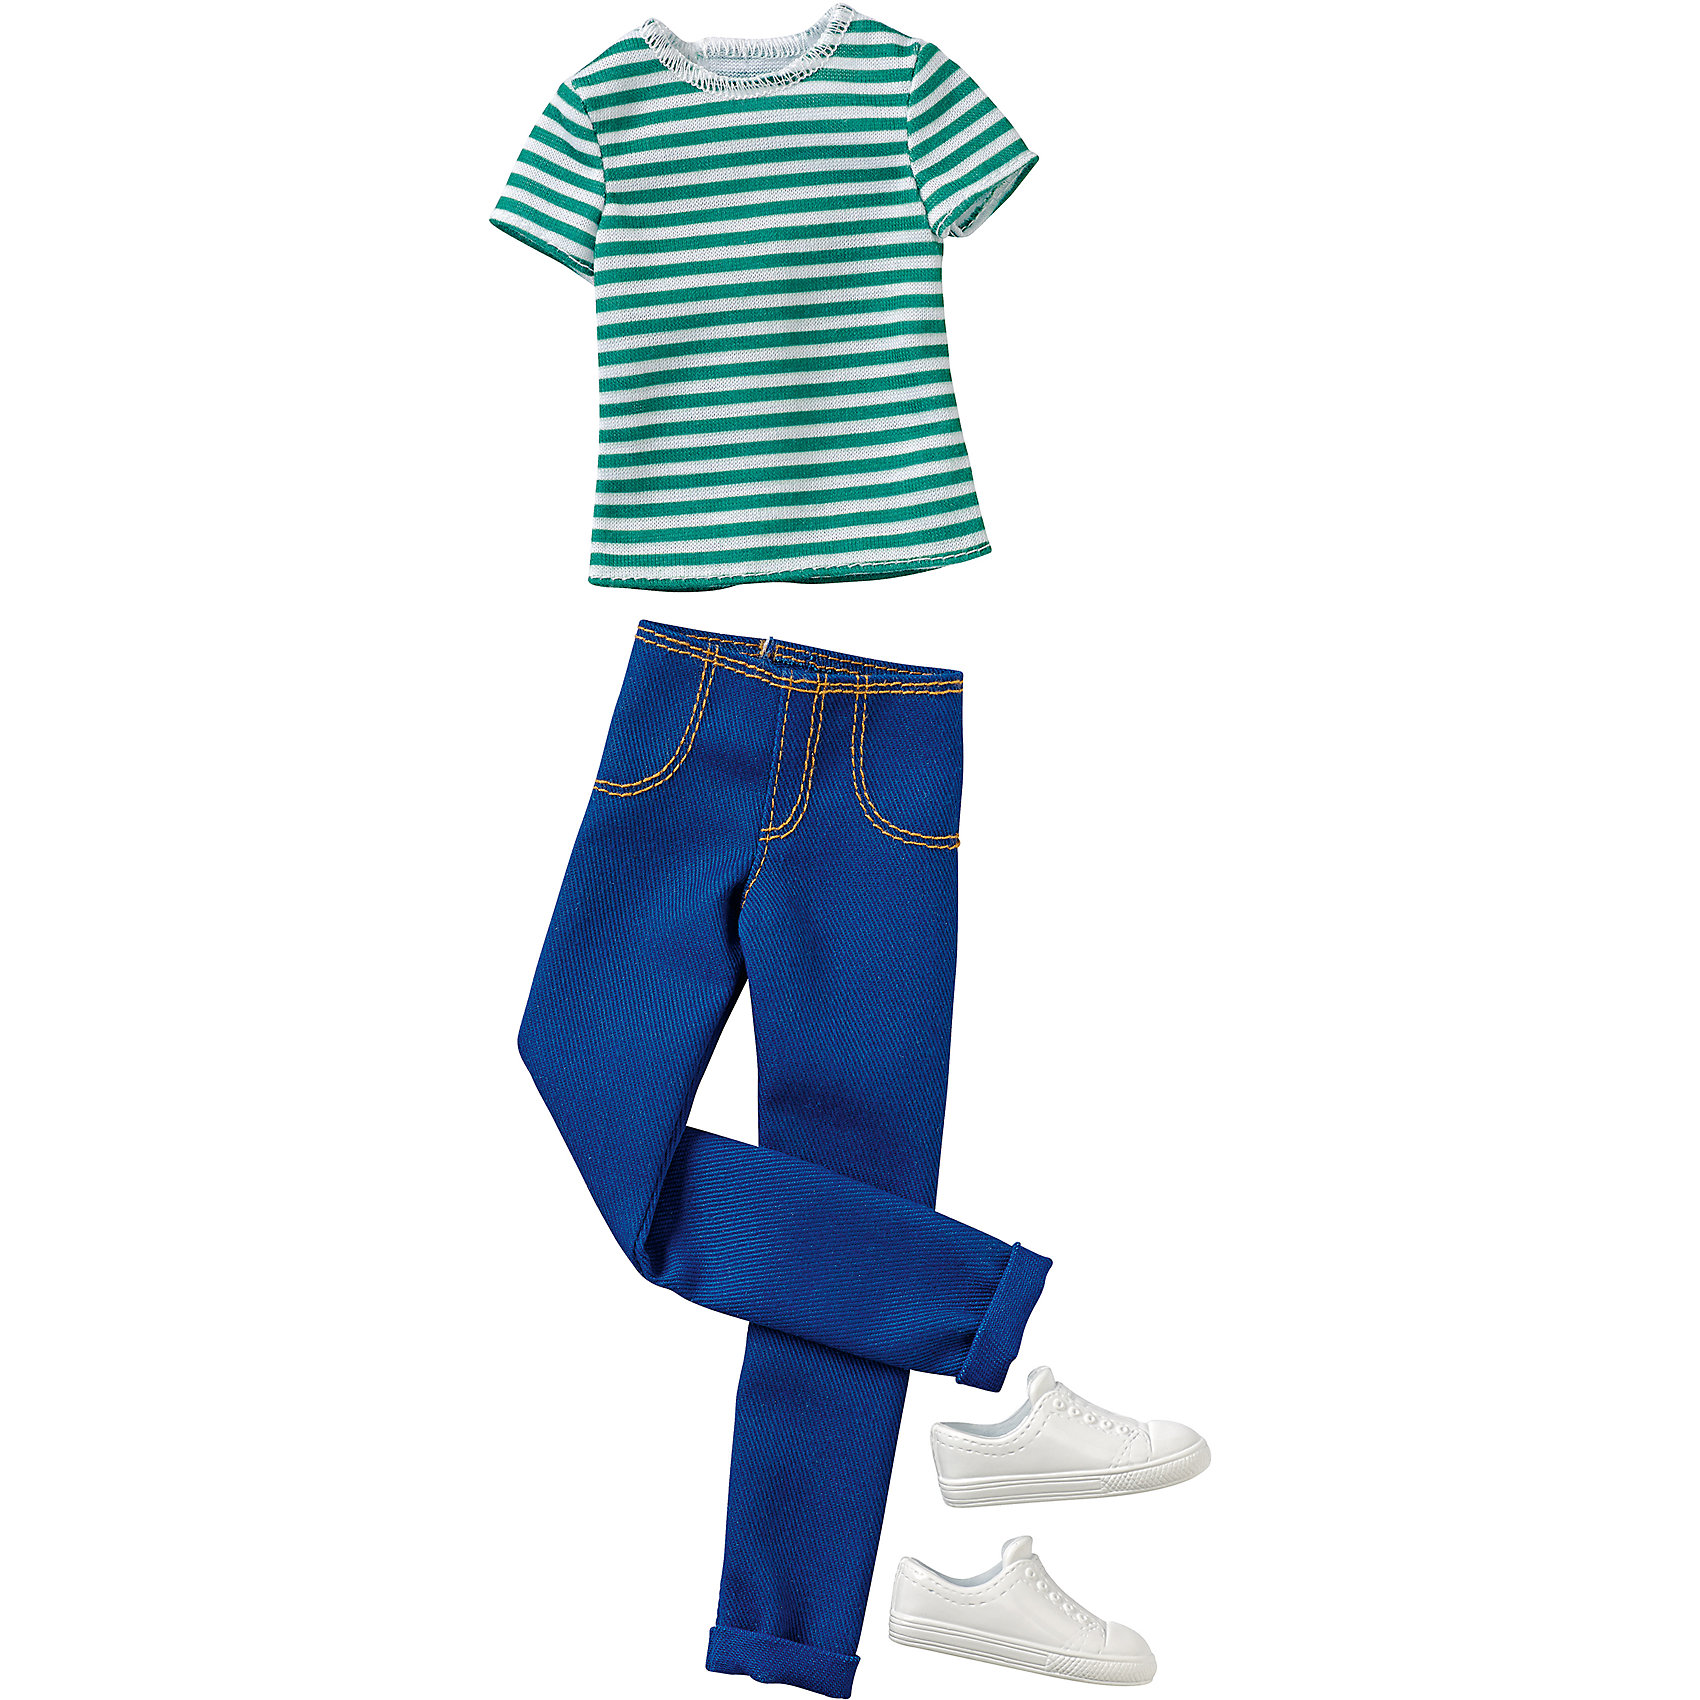 Mattel Одежда для Кена, Barbie mattel mattel кукла ever after high мишель мермейд